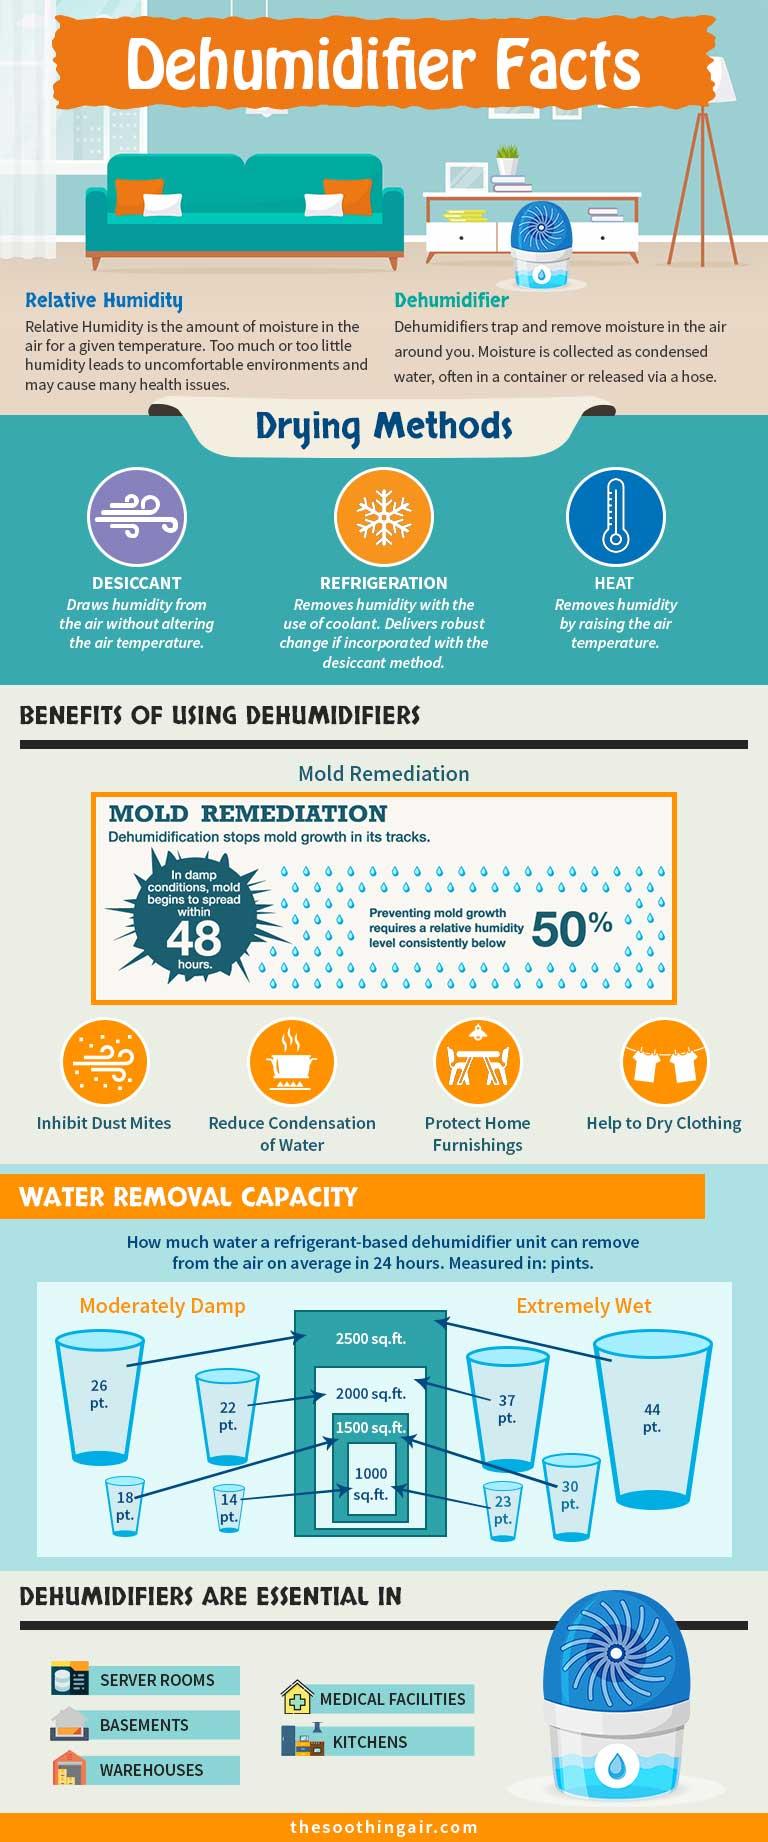 Dehumidifier Facts; dehumidifier benefits